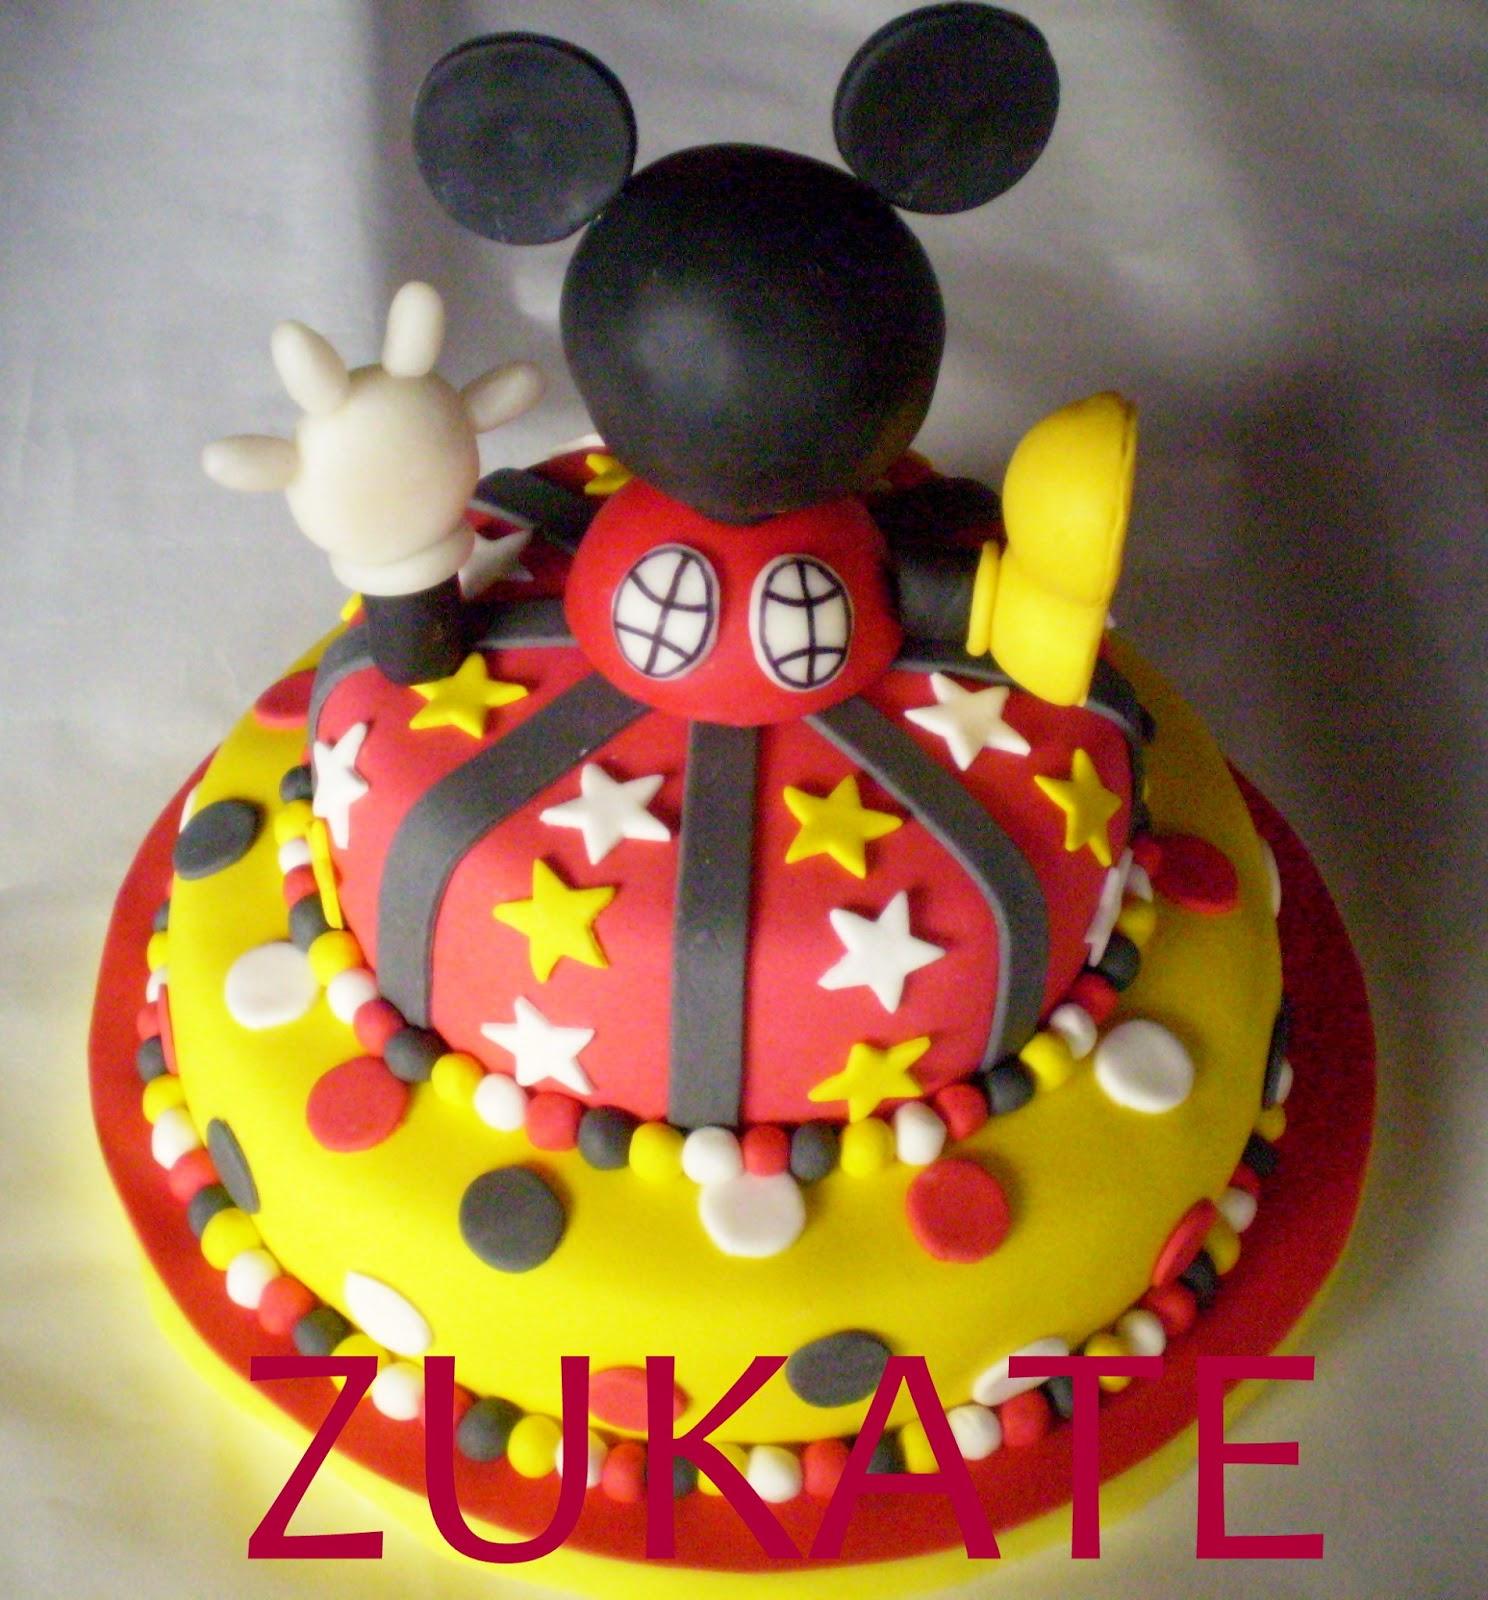 Torta Mickey Mouse Club House Zukate